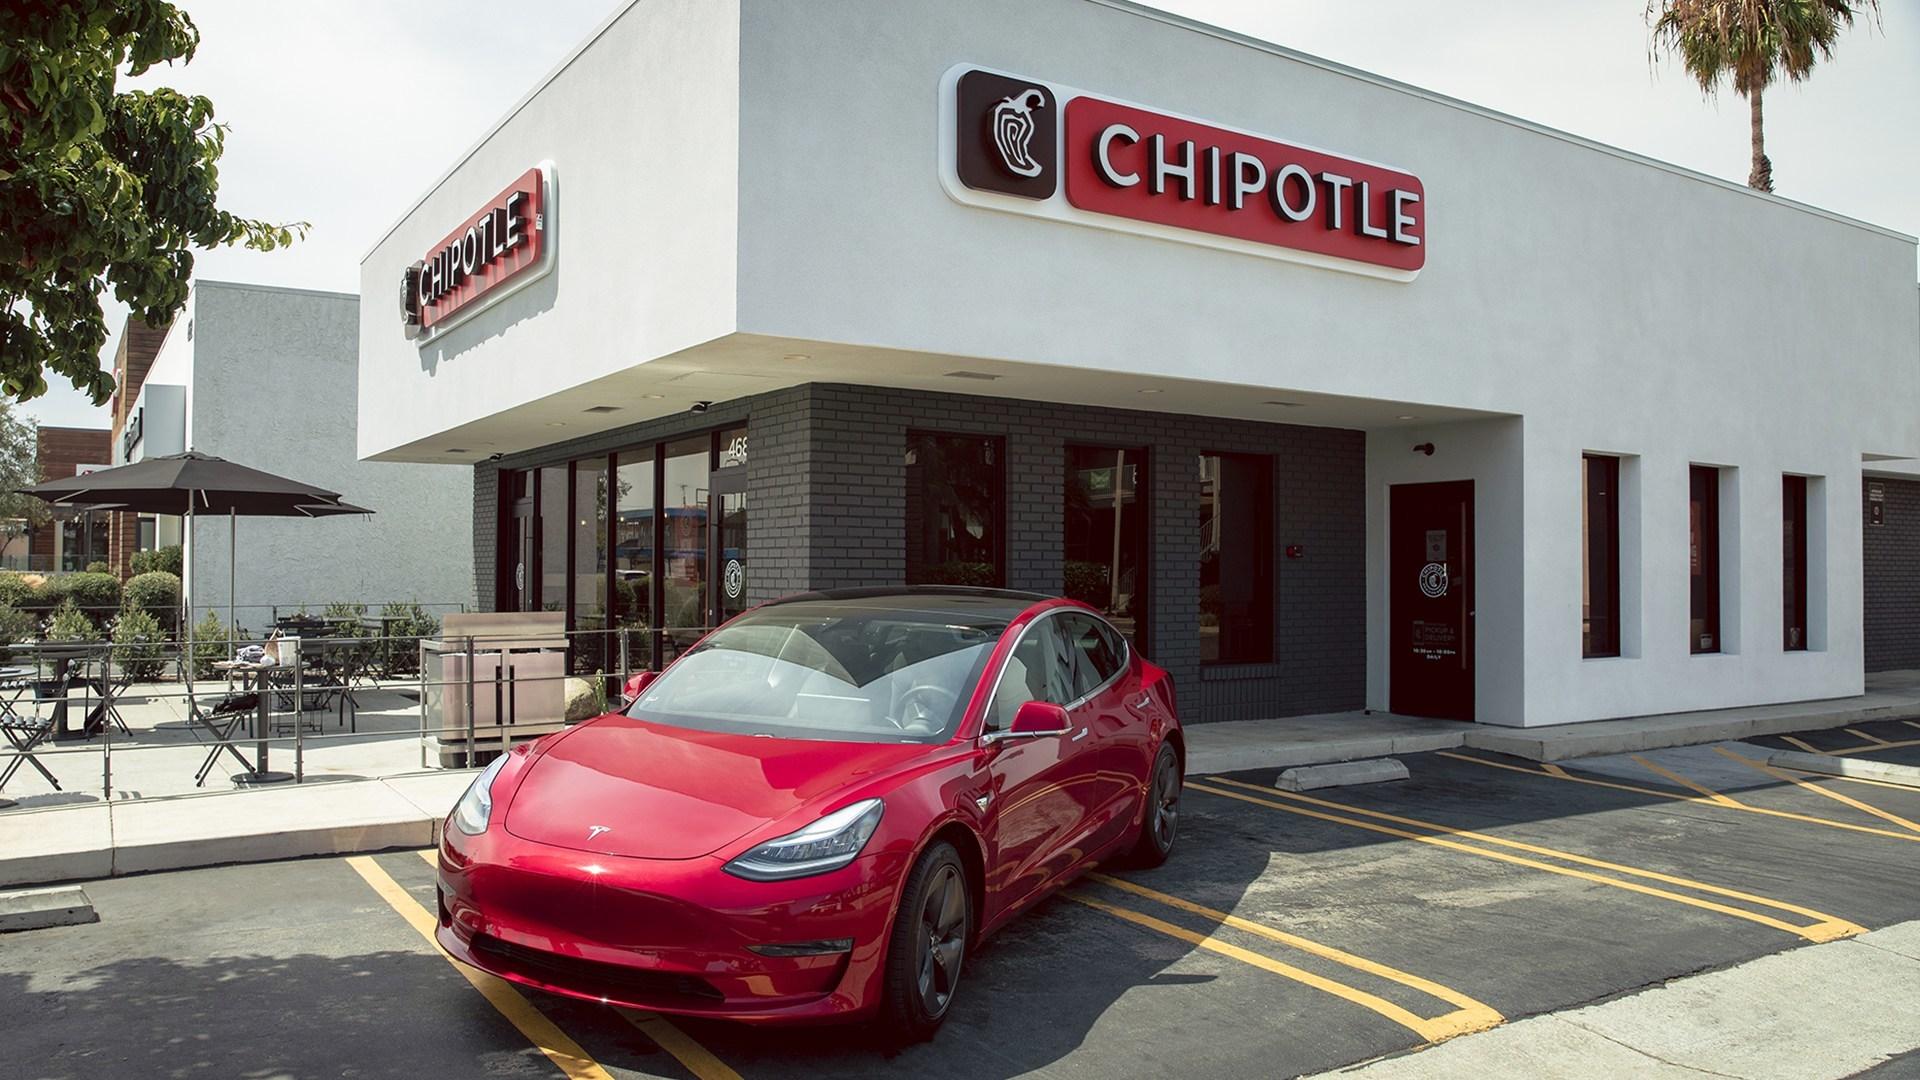 Chipotle 2021 Tesla Model 3 Award Car